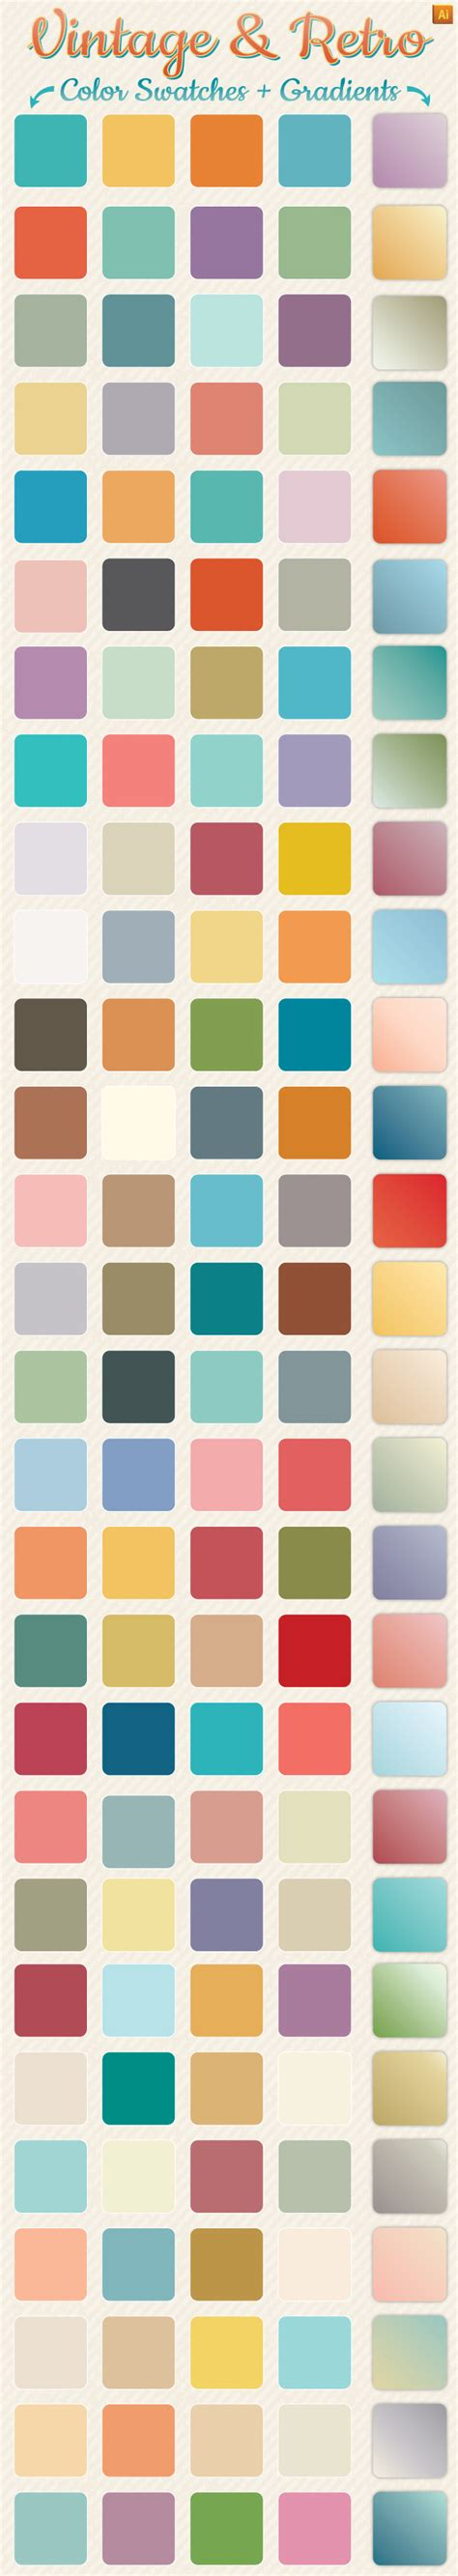 color pattern swatch illustrator vintage retro gradients color swatches colors